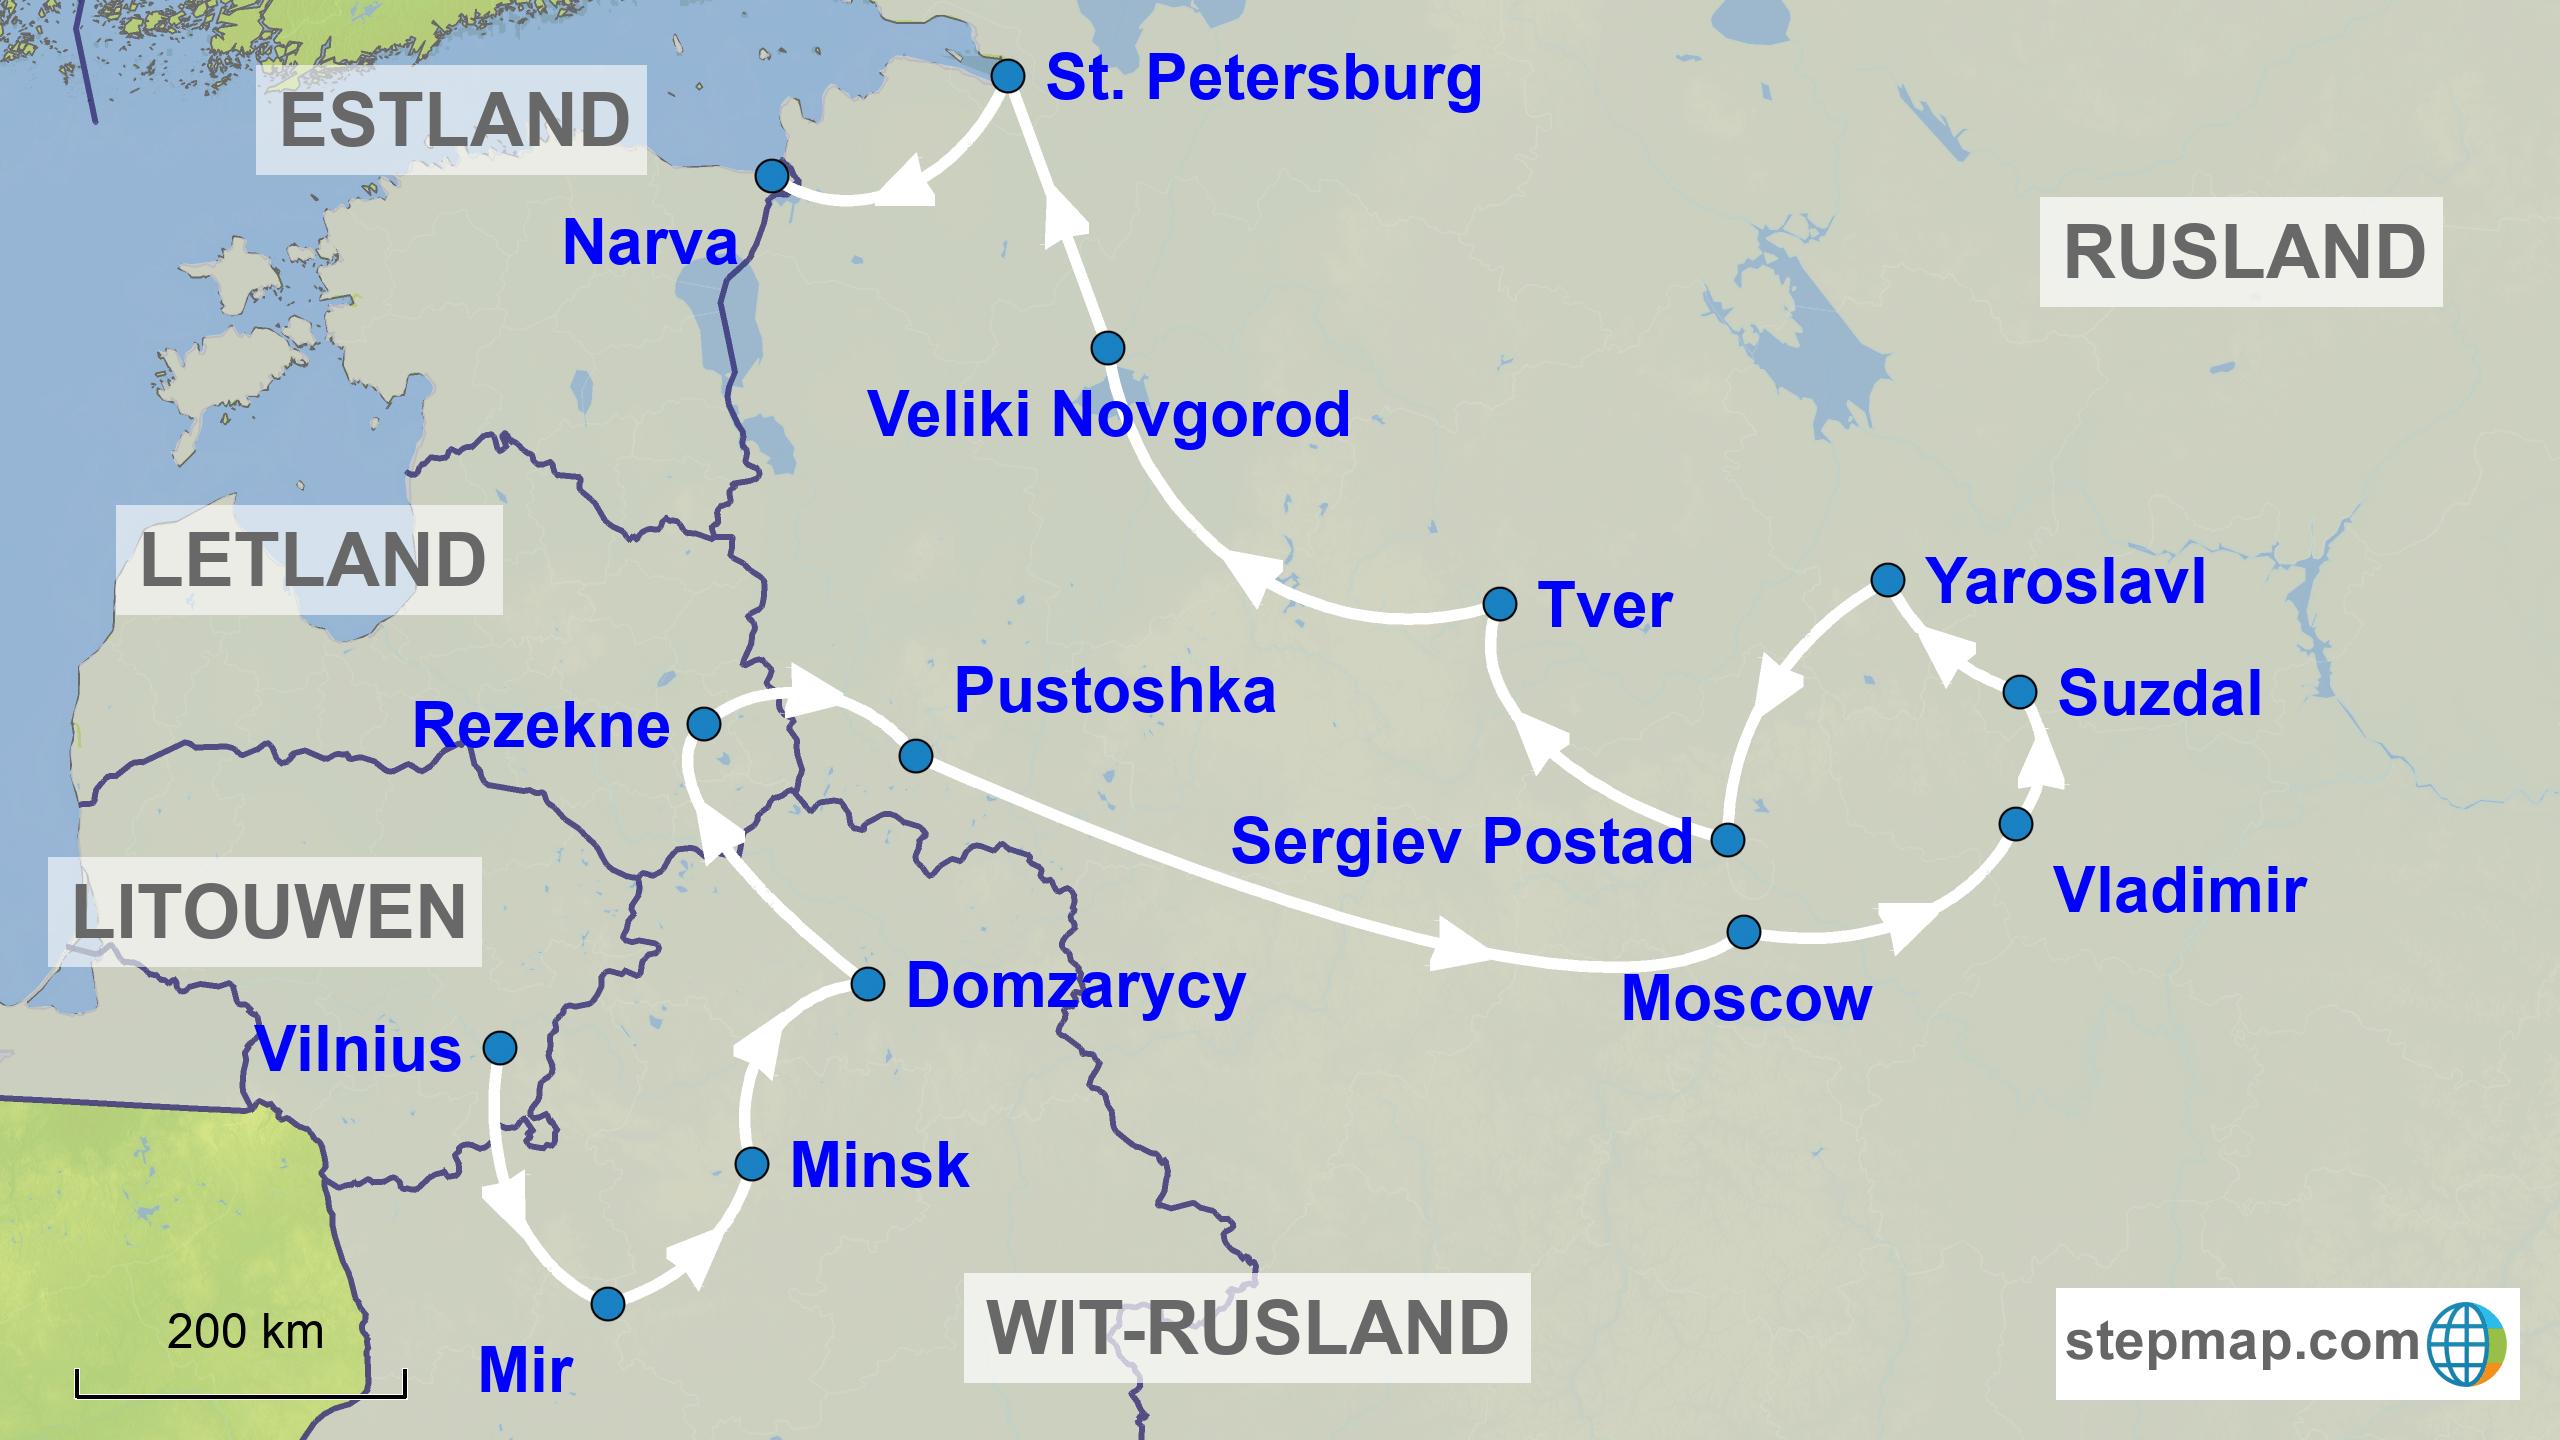 Wit-Rusland - Rusland